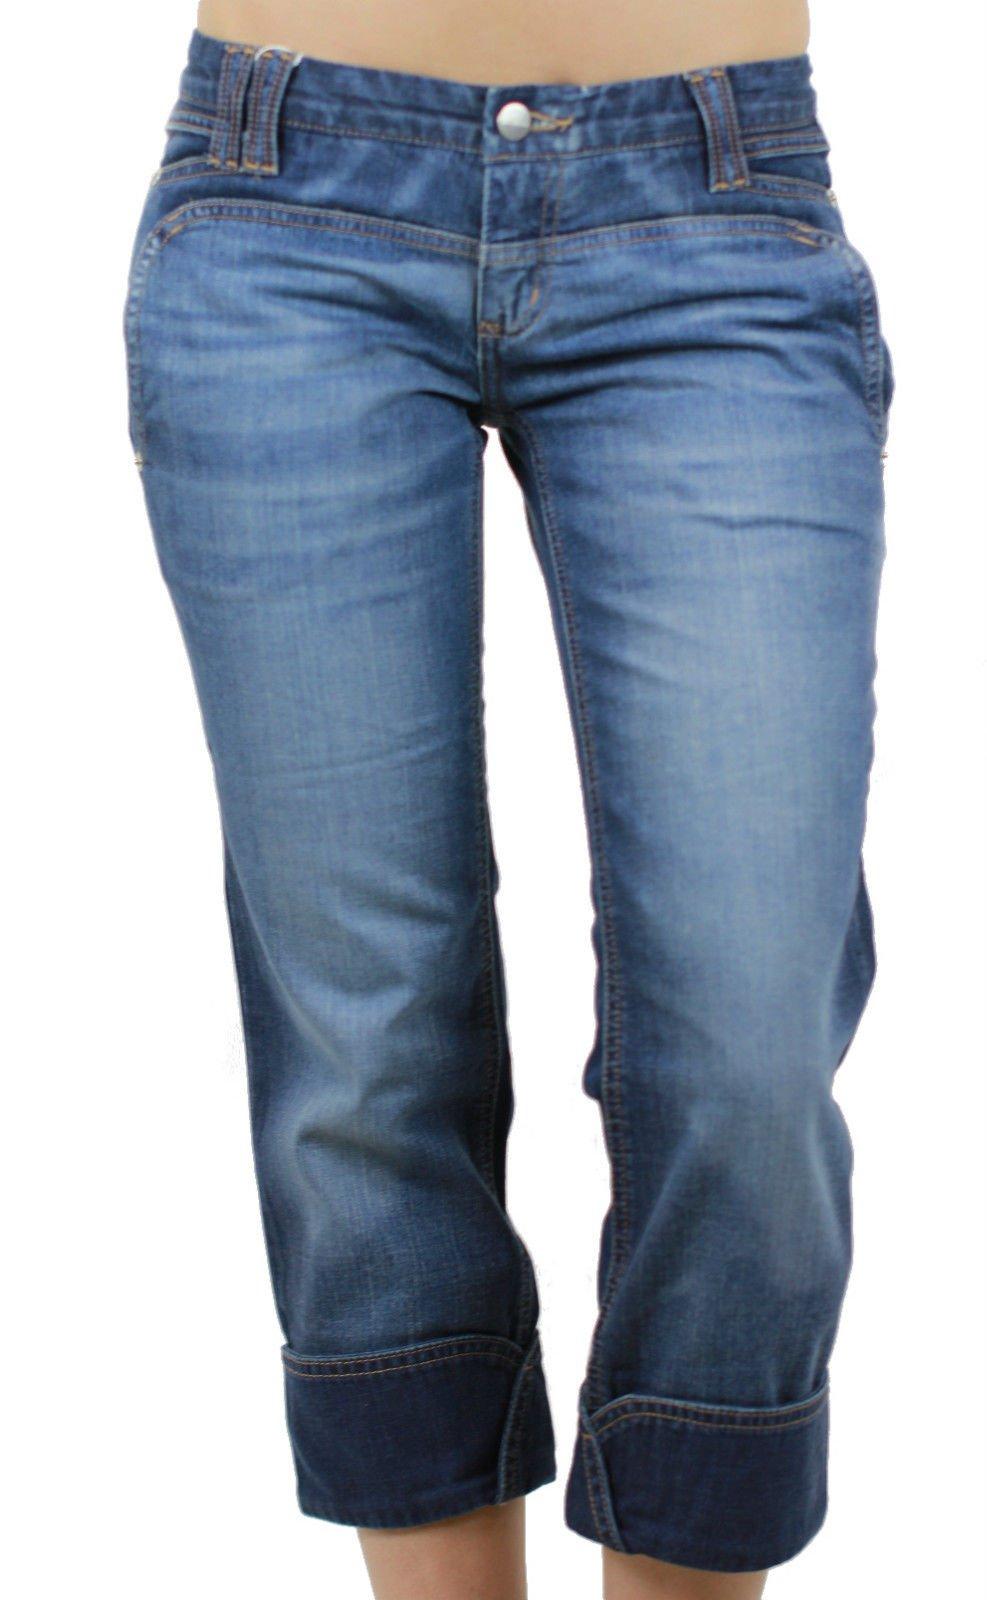 Custo Barcelona Women's Jeans Belona Cropped Capri Jeans 27 Rinsed Denim